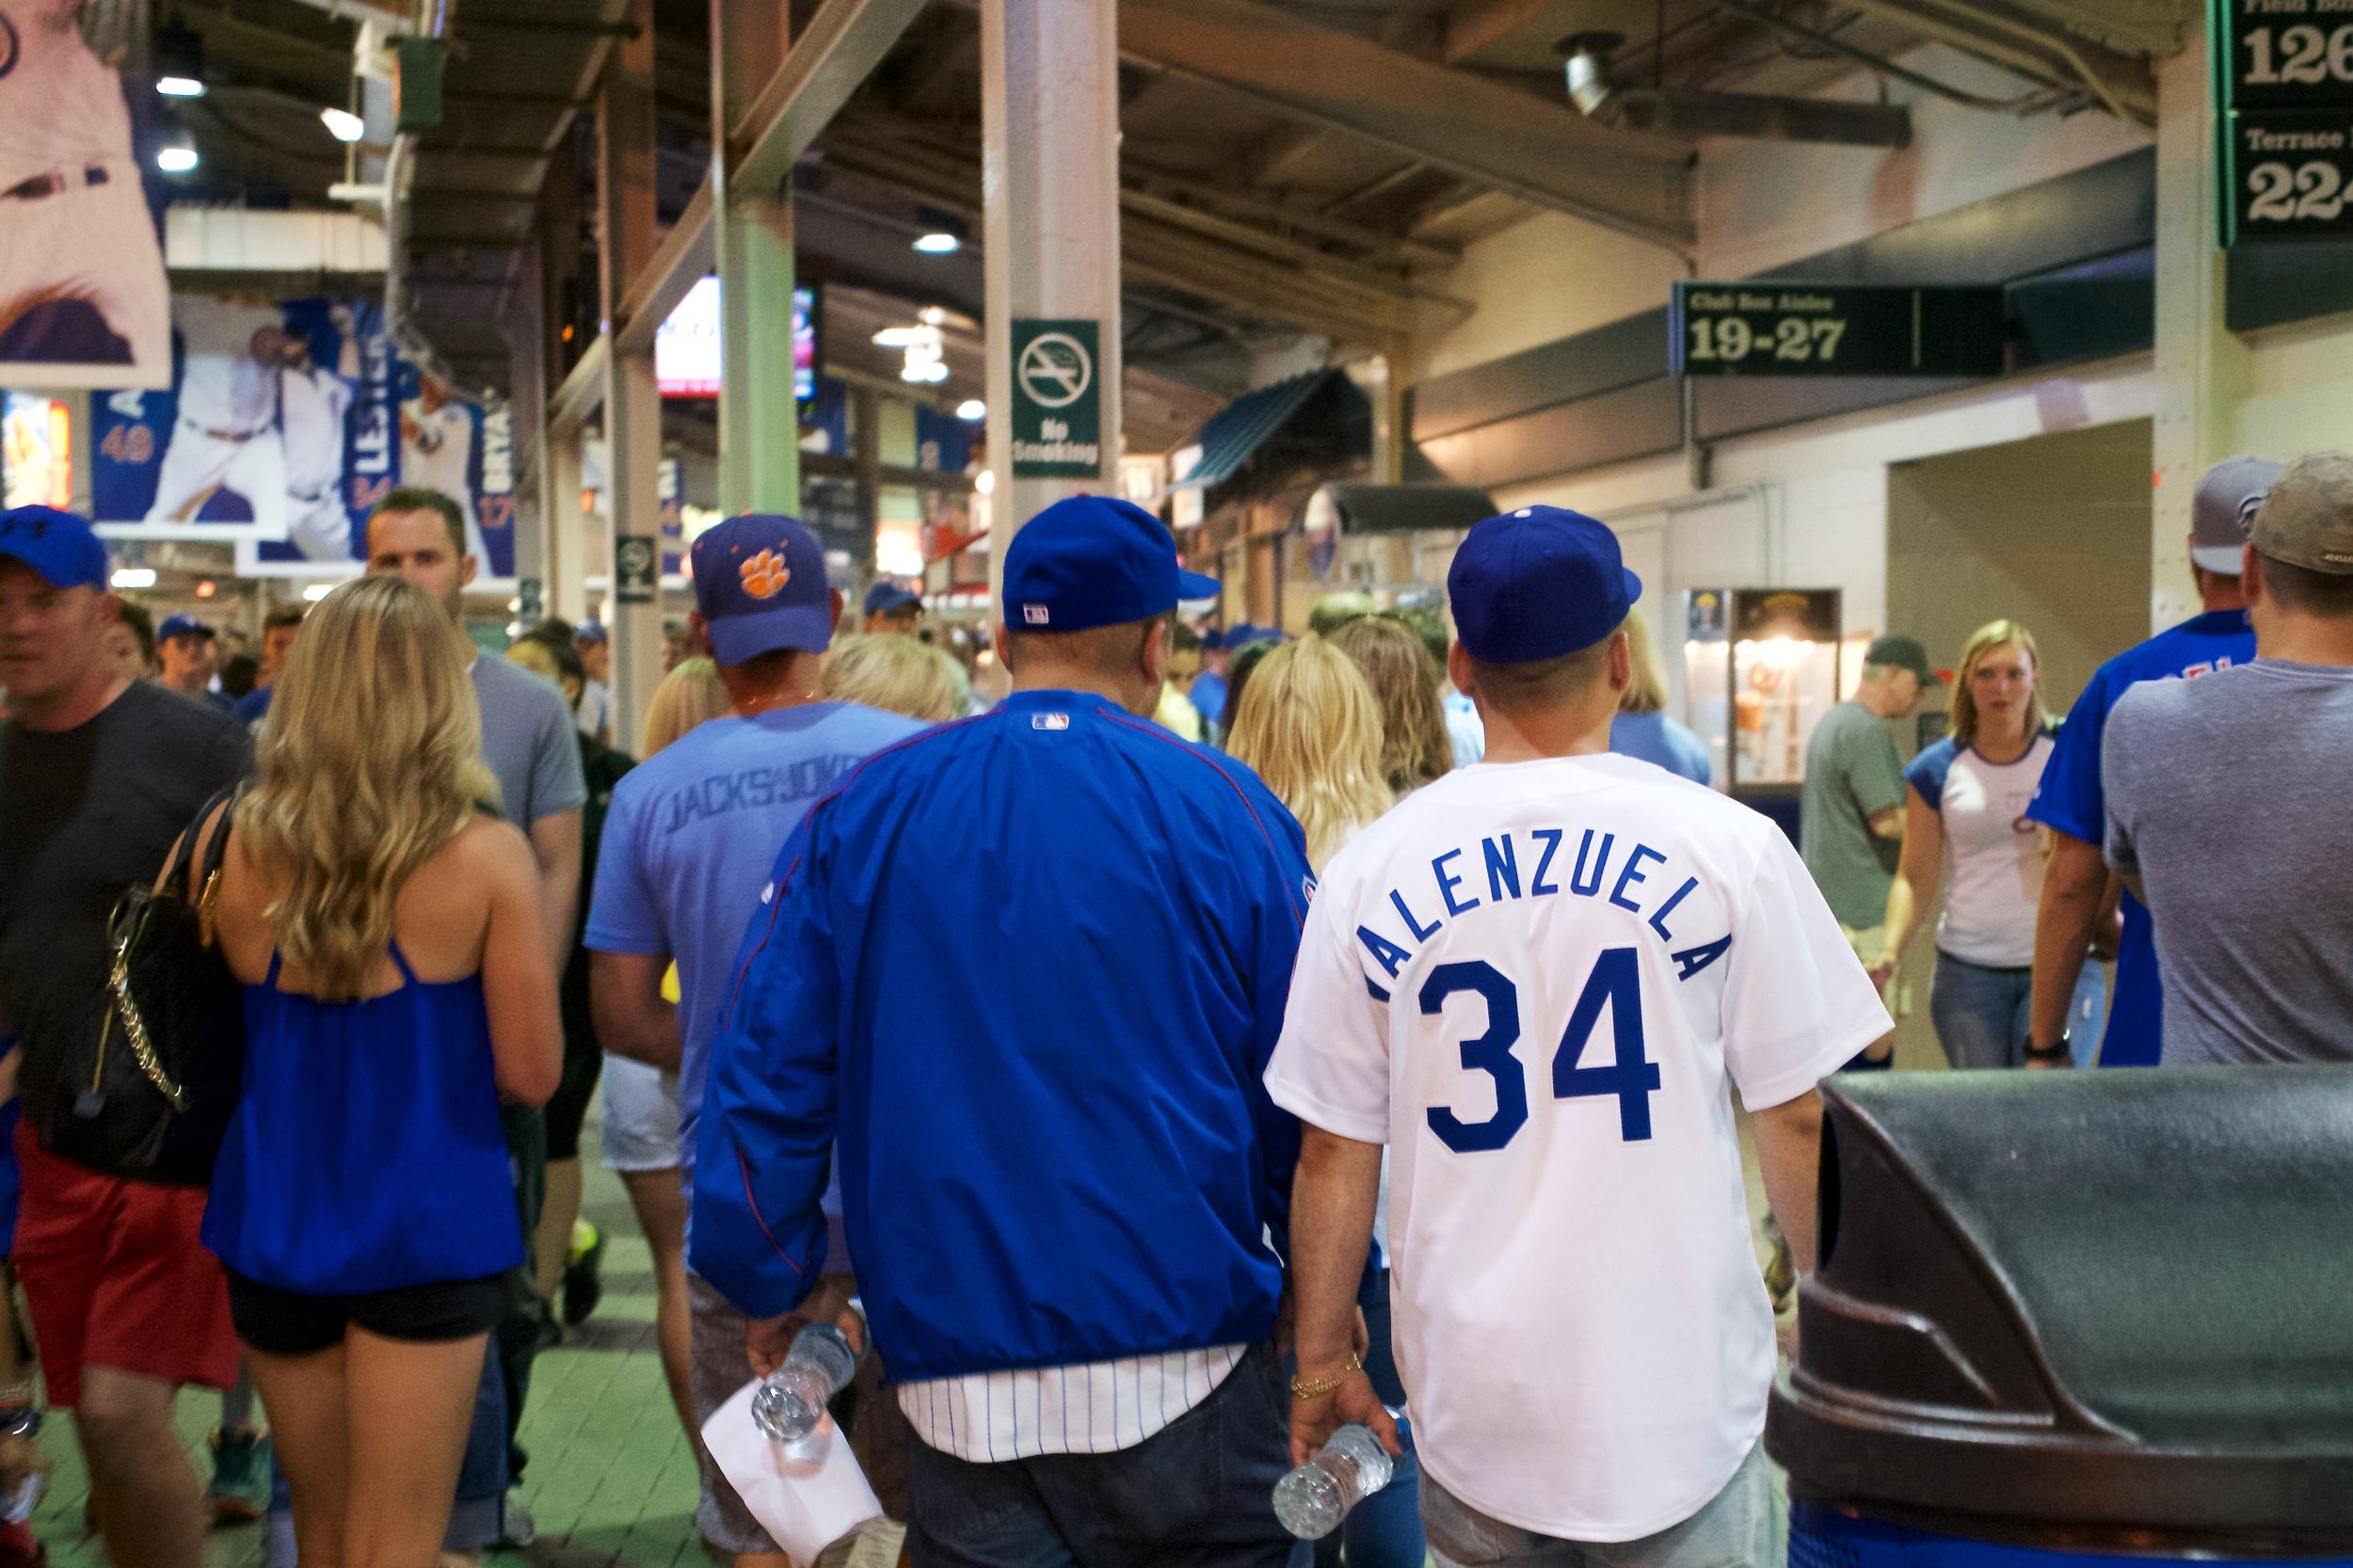 This Dodgers fan was sporting a Fernando Valenzuela jersey